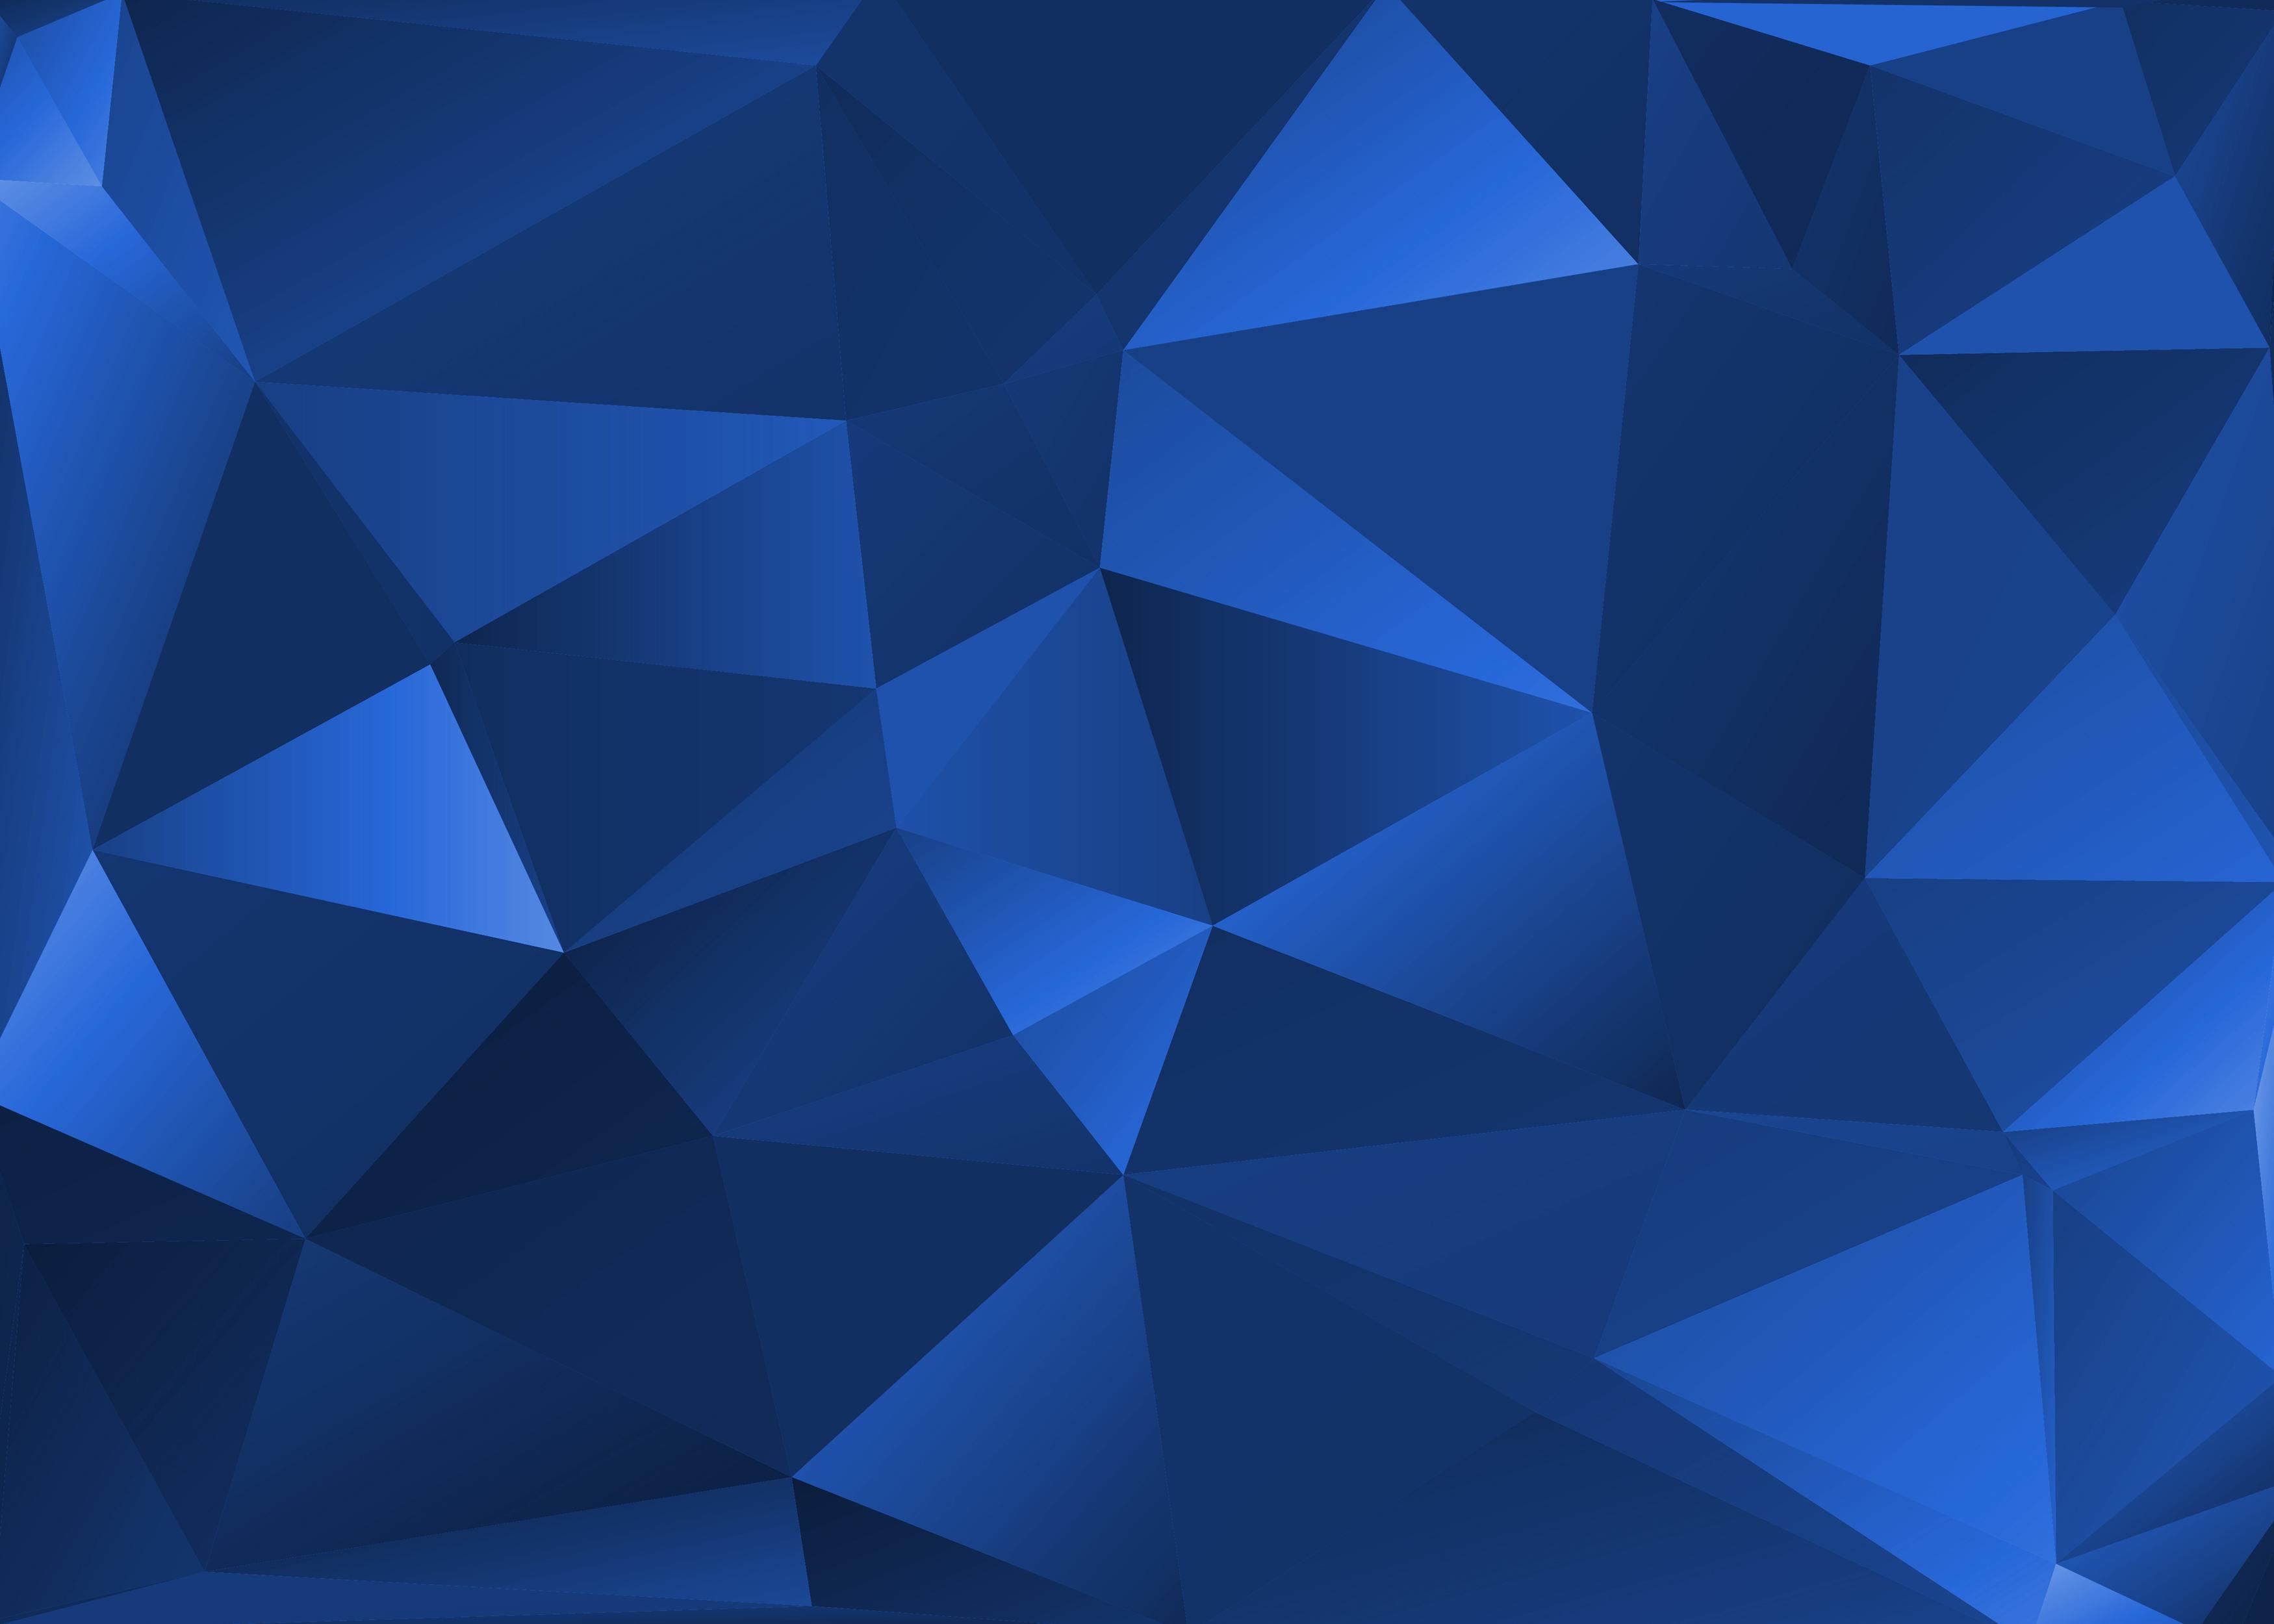 High Res Polygon Backgrounds Vol 1  Texturezine 3500x2500